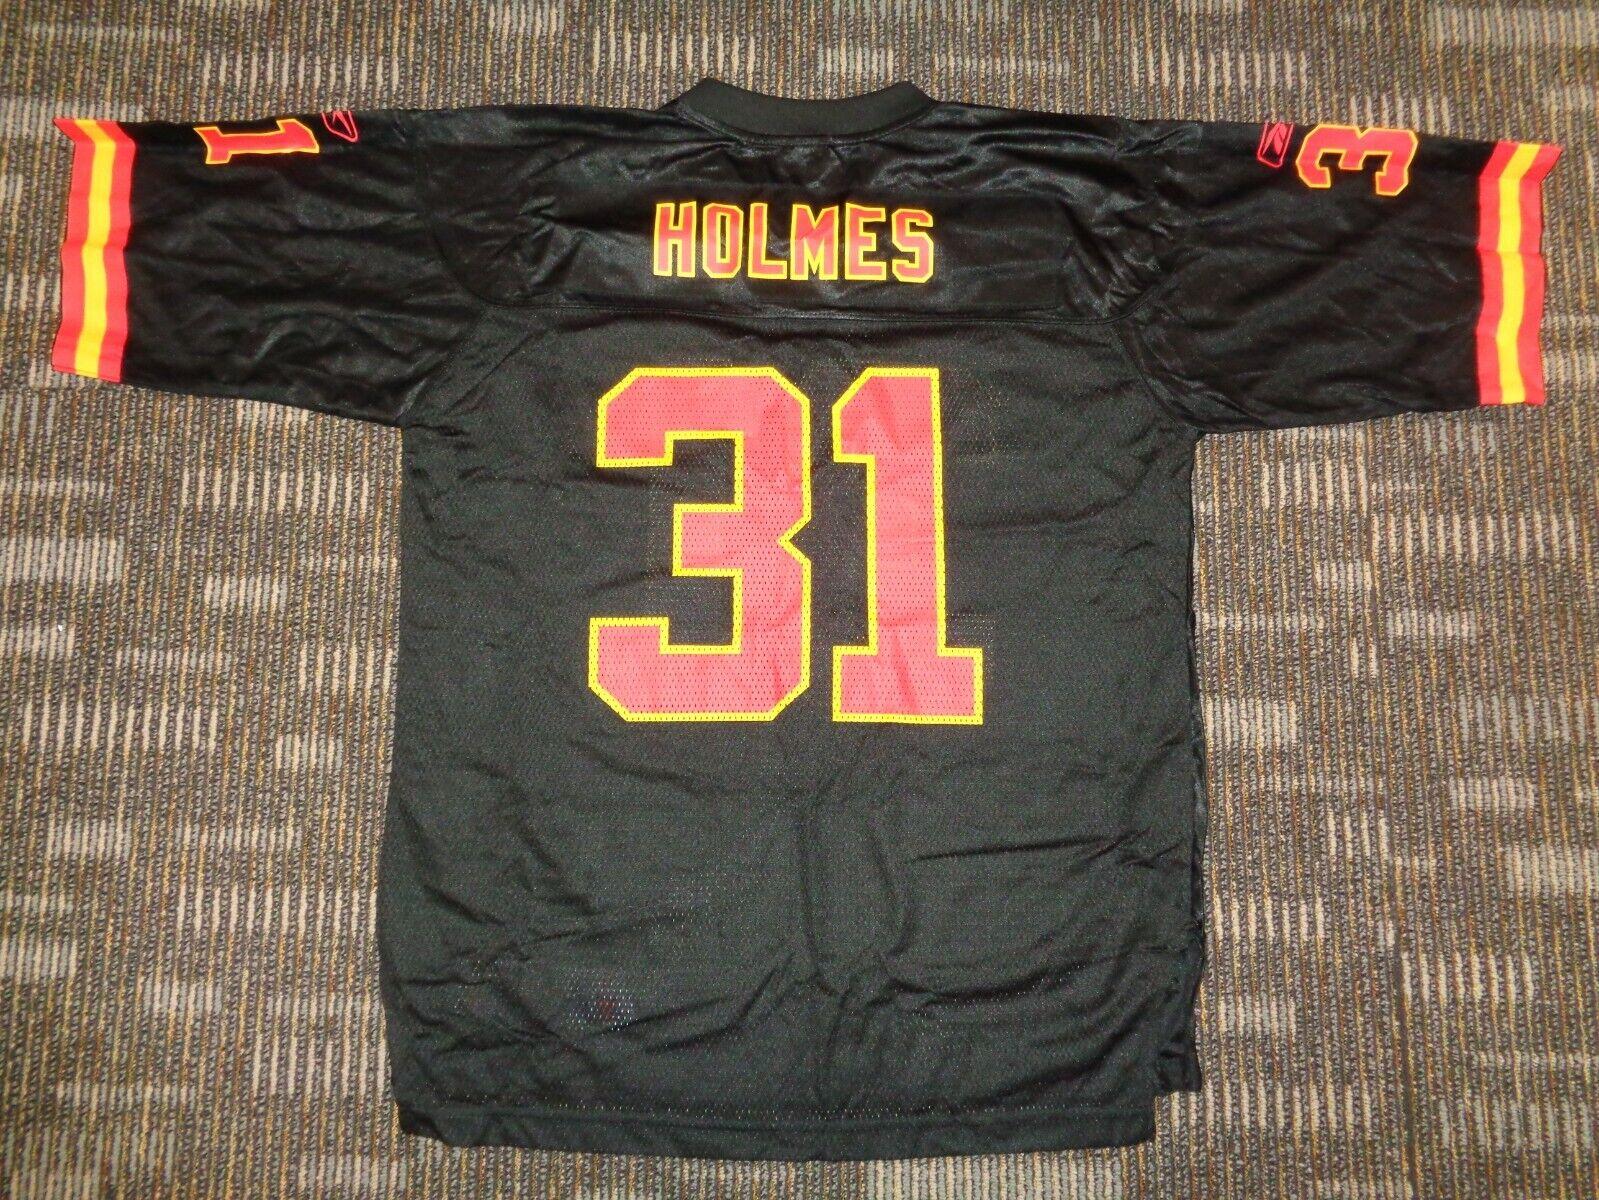 PRIEST HOLMES 31 REEBOK KC KANSAS CITY CHIEFS BLACK NFL GAME FOOTBALL JERSEY LG - $39.99